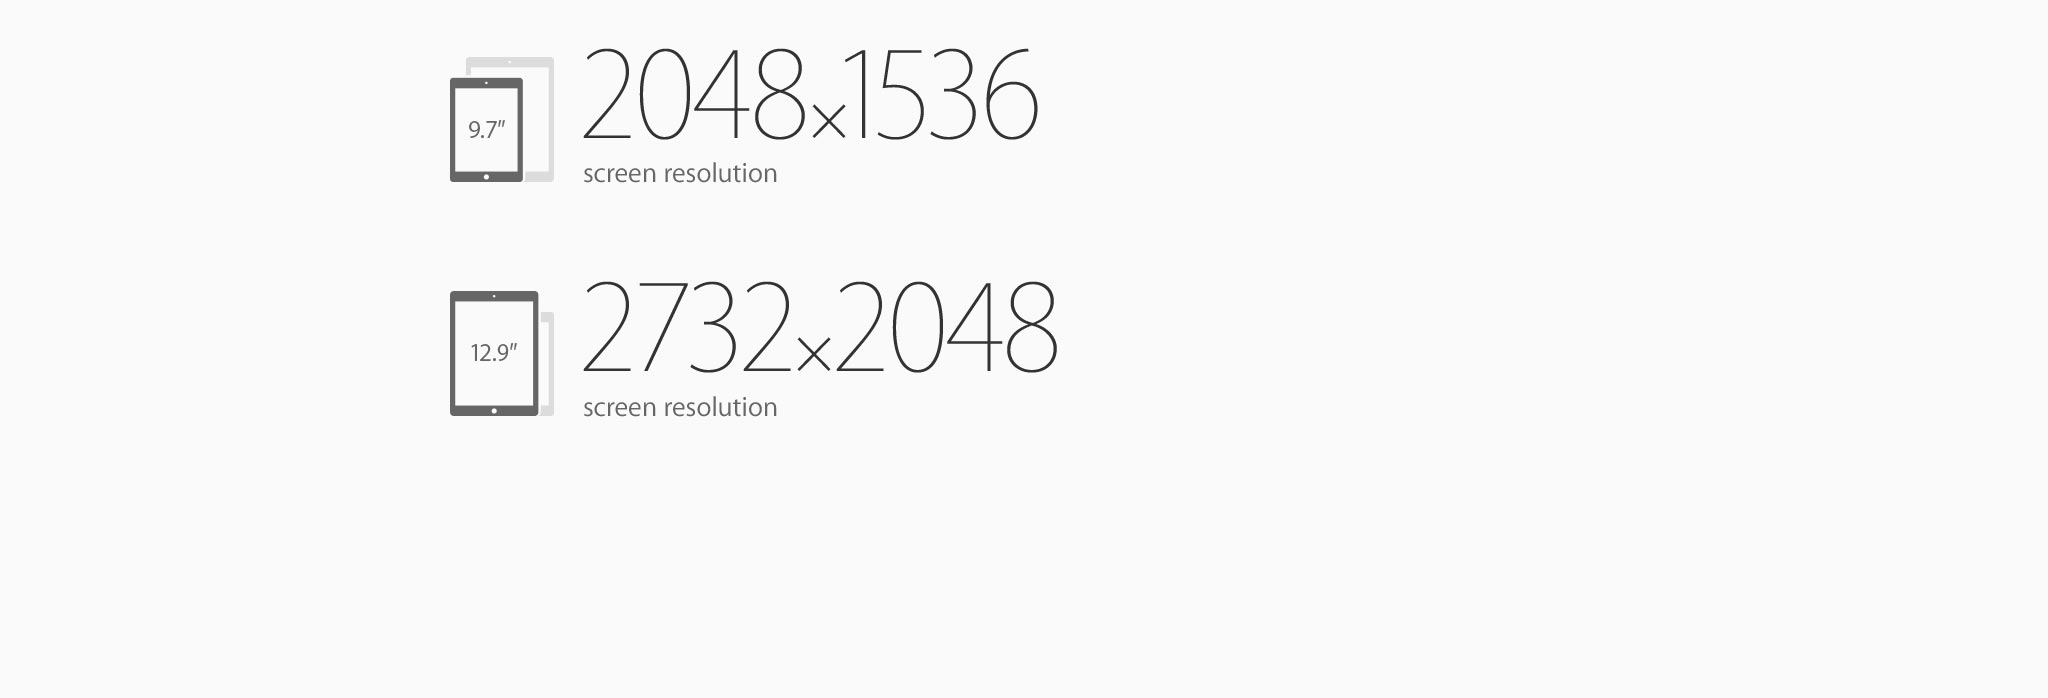 2048x1536 screen resolution. 2732x2048 screen resolution